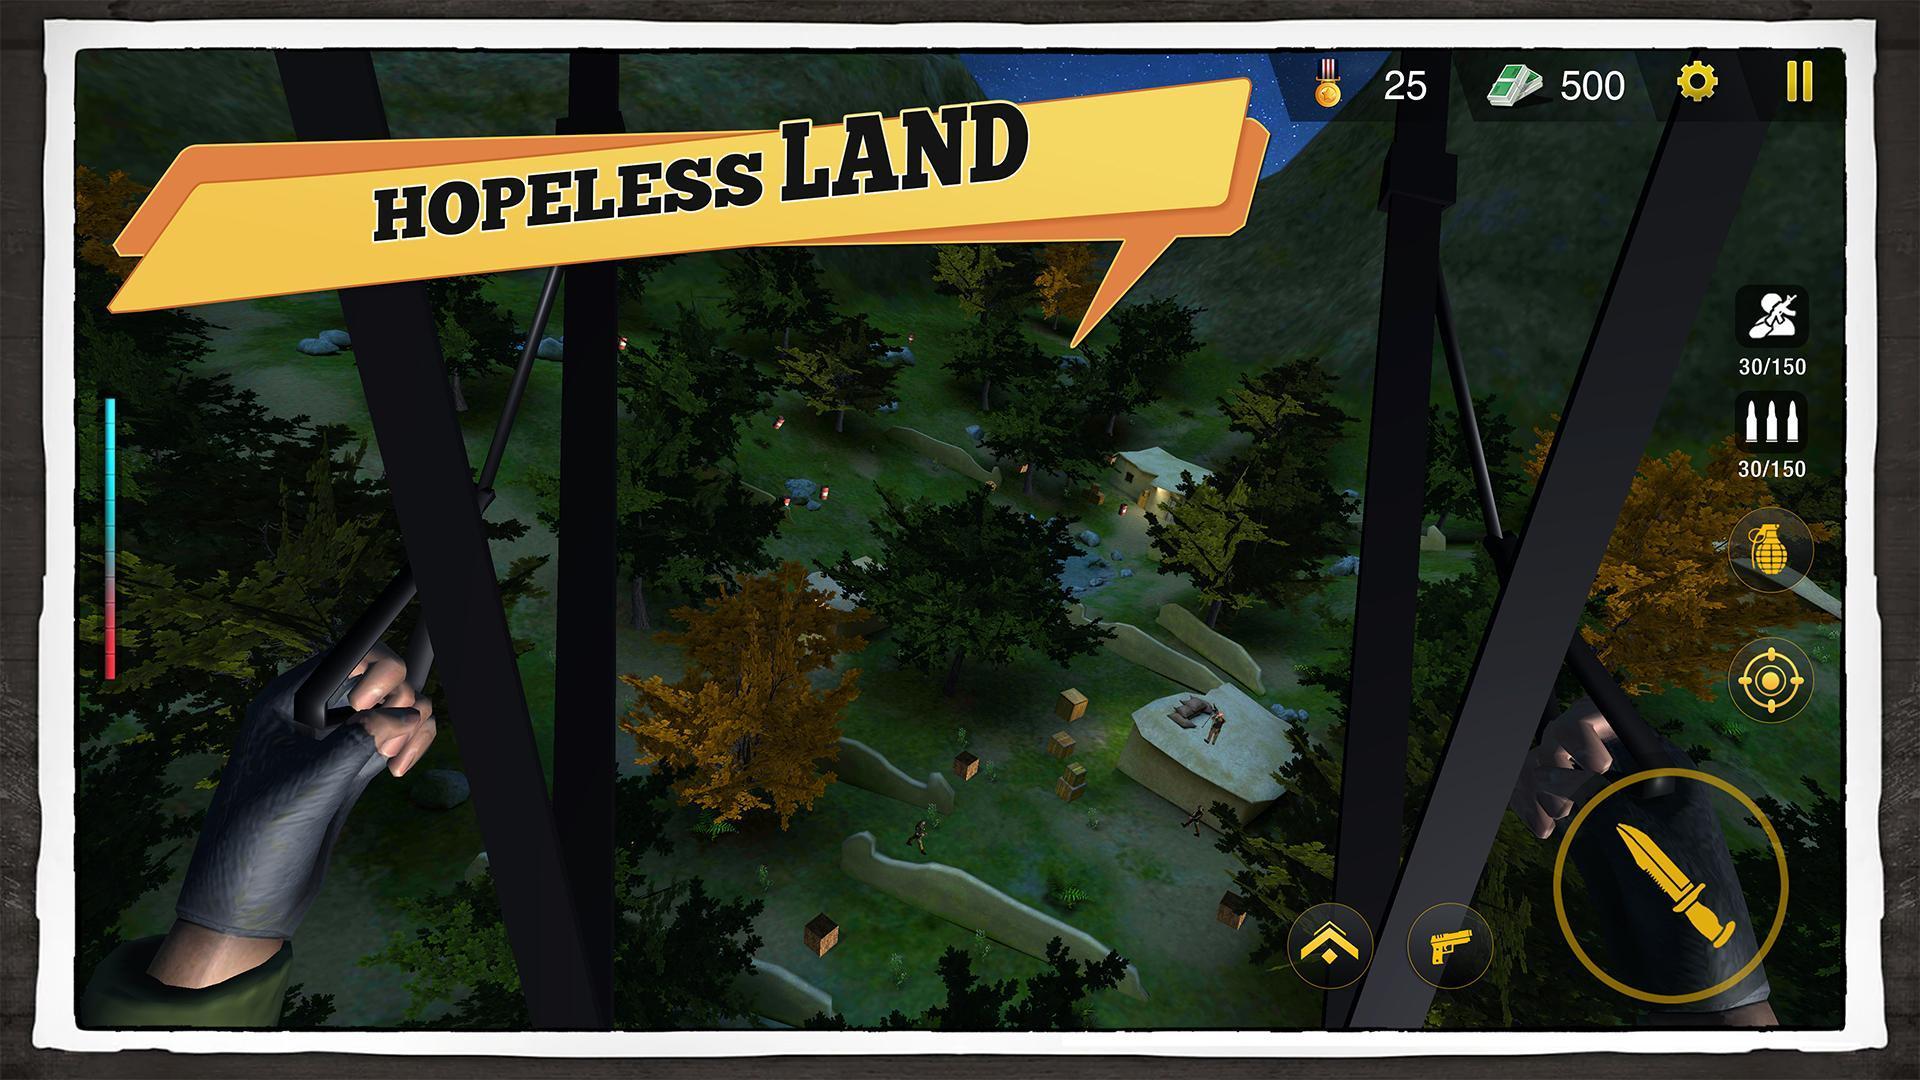 Yalghaar Delta IGI Commando Adventure Mobile Game 3.4 Screenshot 19